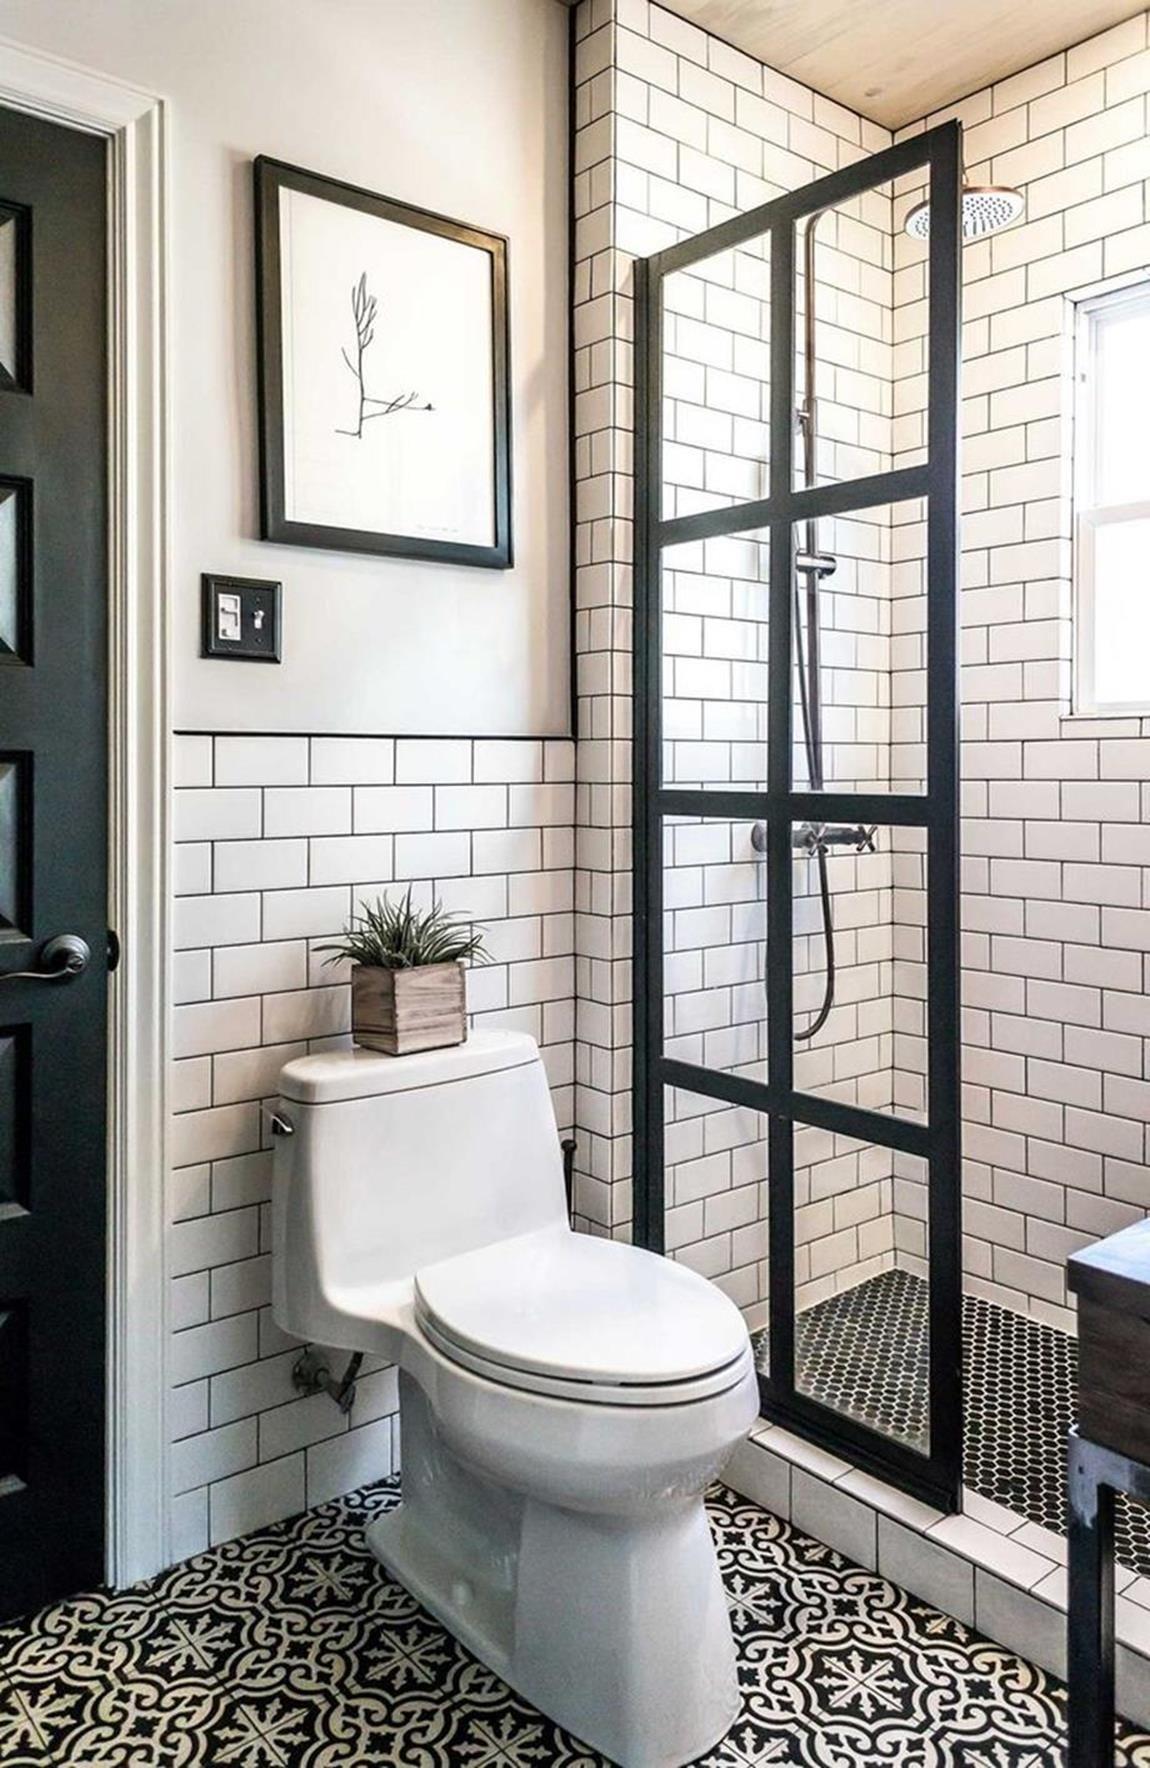 27 Adorable Spa Bathroom Ideas For Small Bathrooms Cheap Bathroom Remodel Small Bathroom Remodel Small Master Bathroom